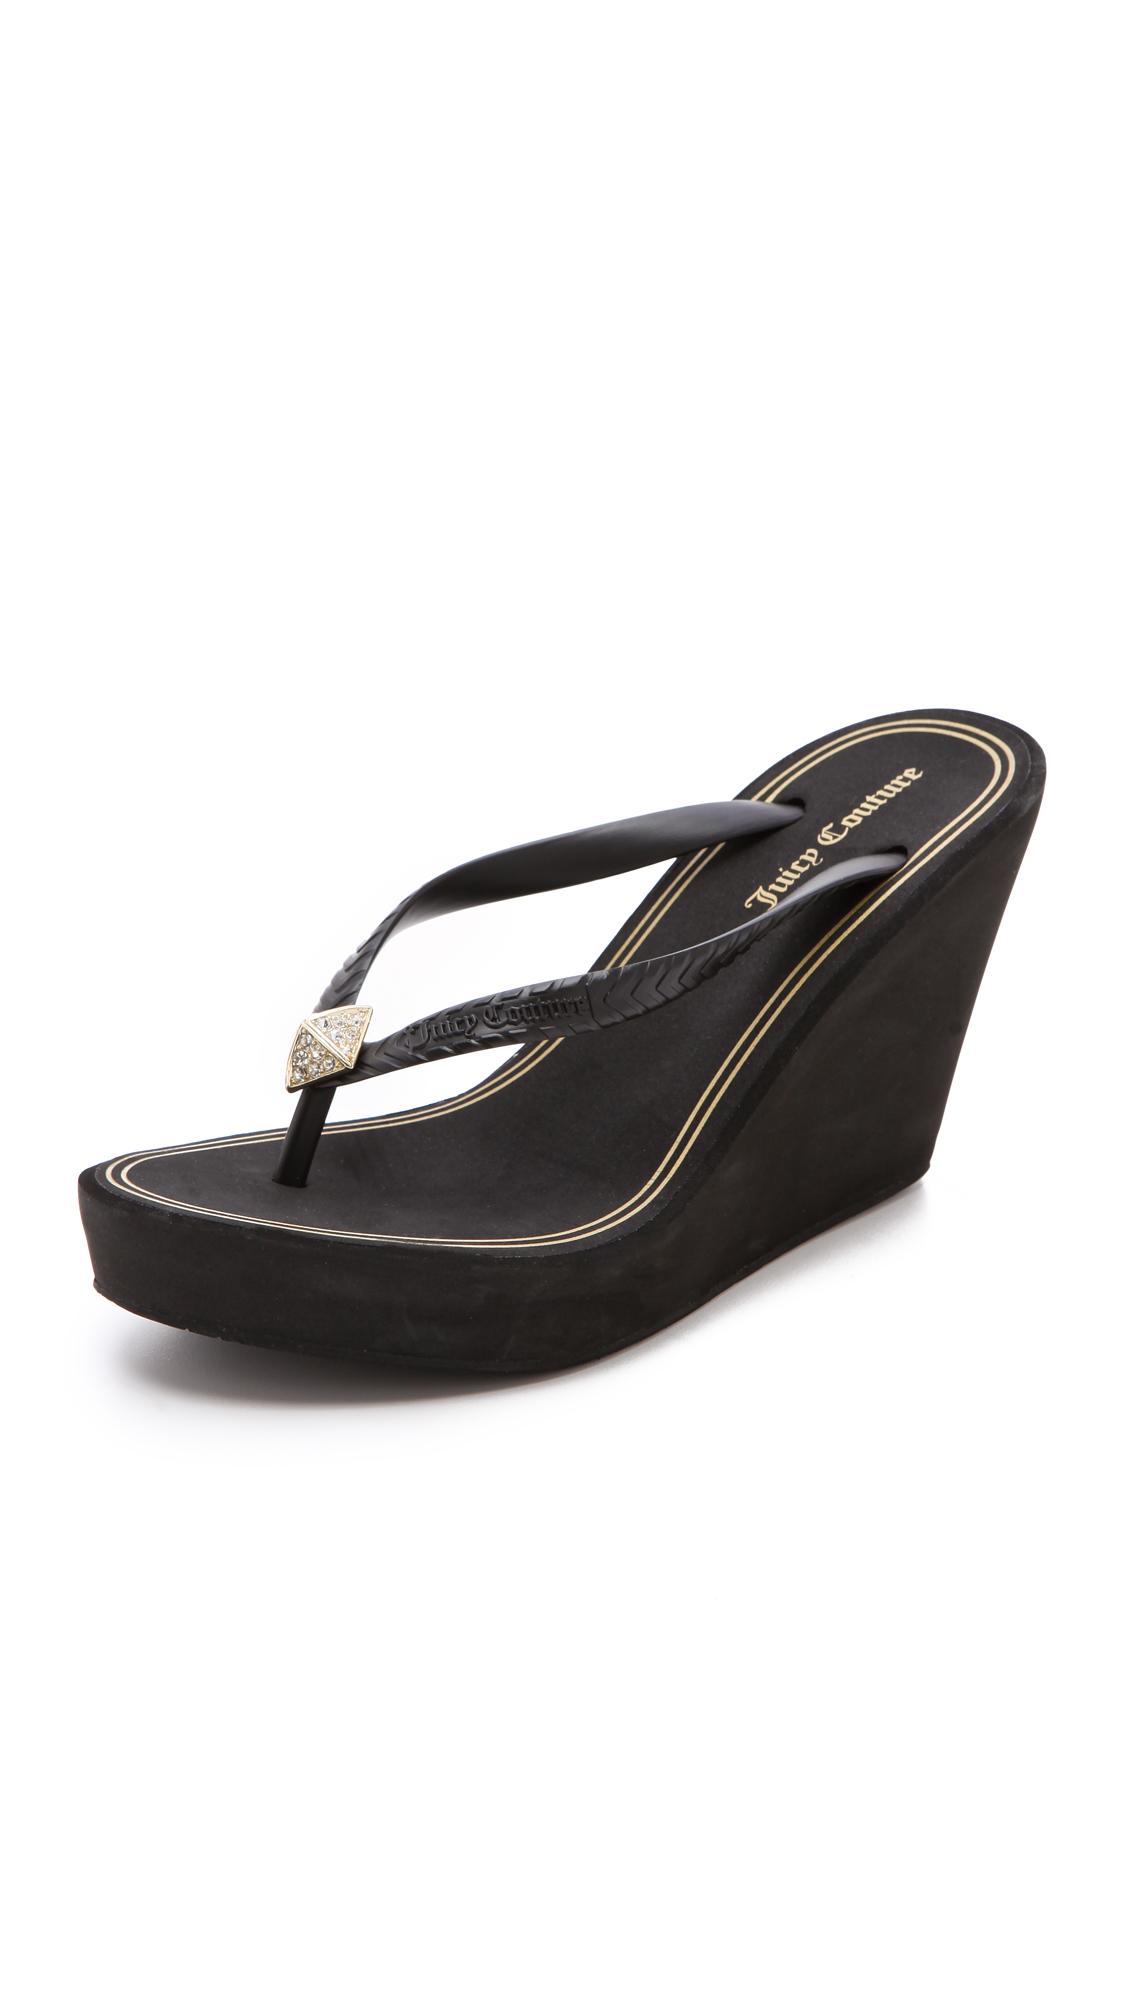 juicy couture britt wedge flip flops in black lyst